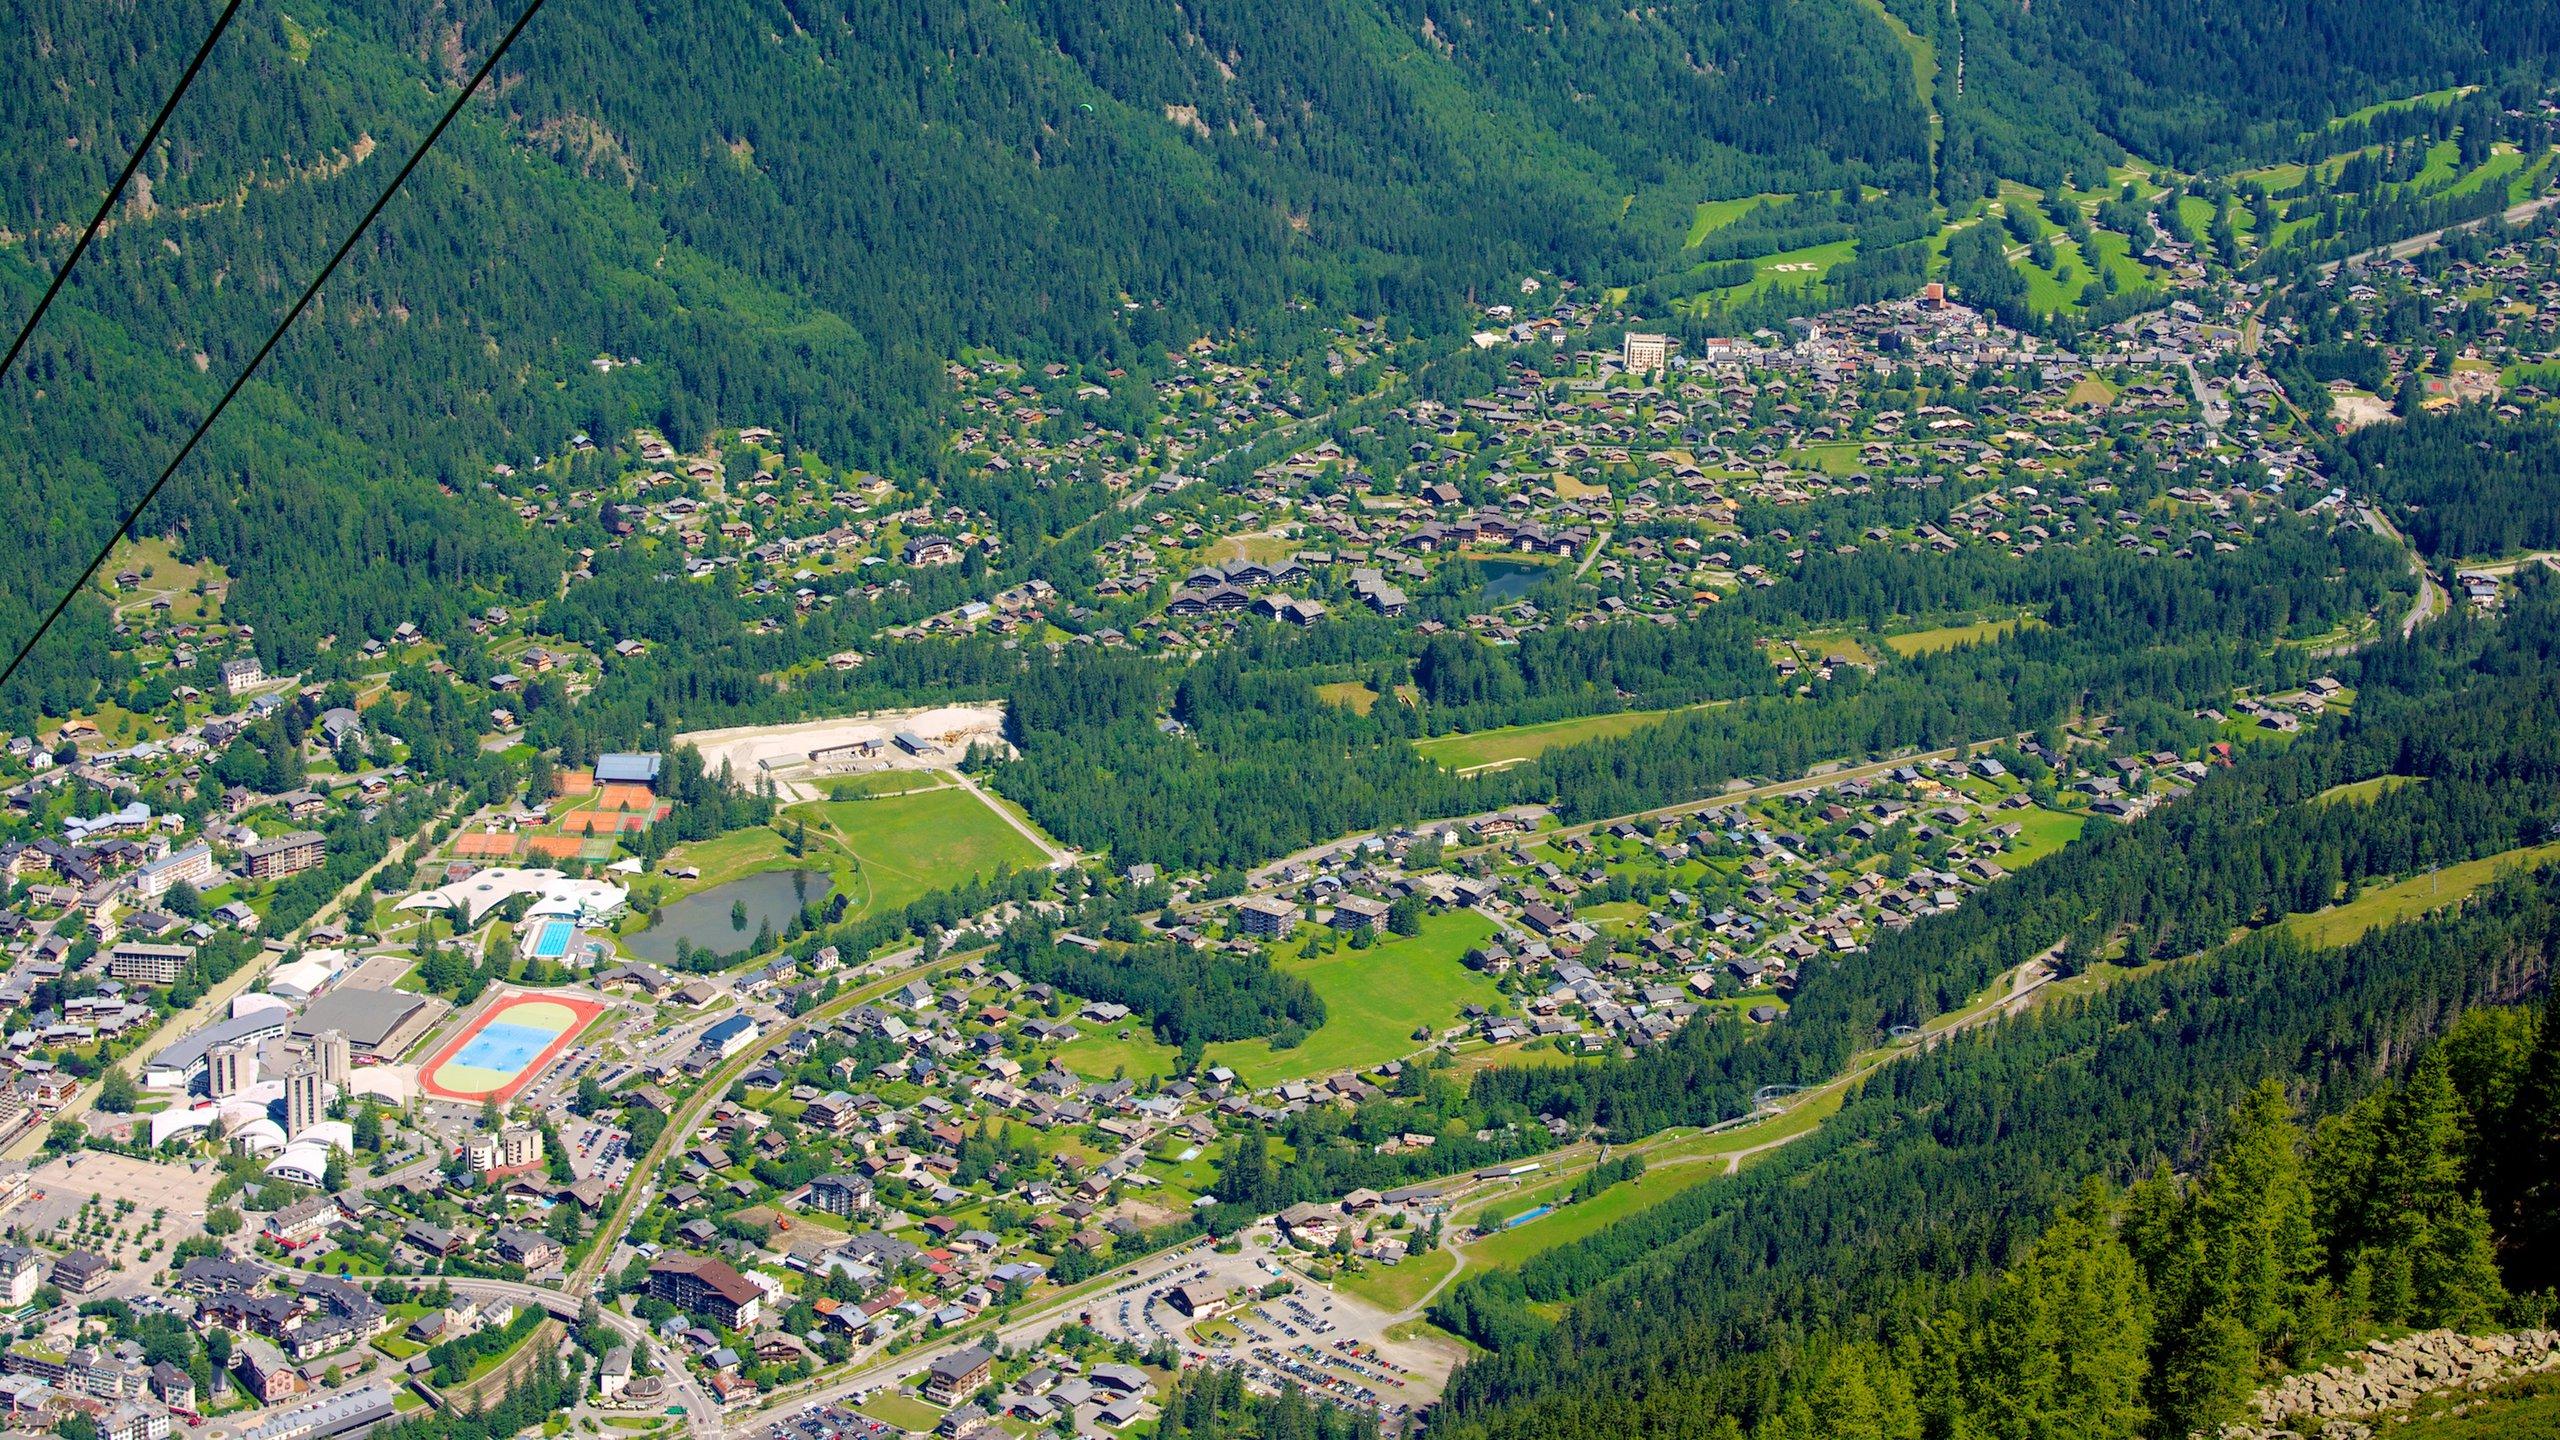 Montaña Aiguille du Midi, Chamonix-Mont-Blanc, Alta Saboya (departamento), Francia